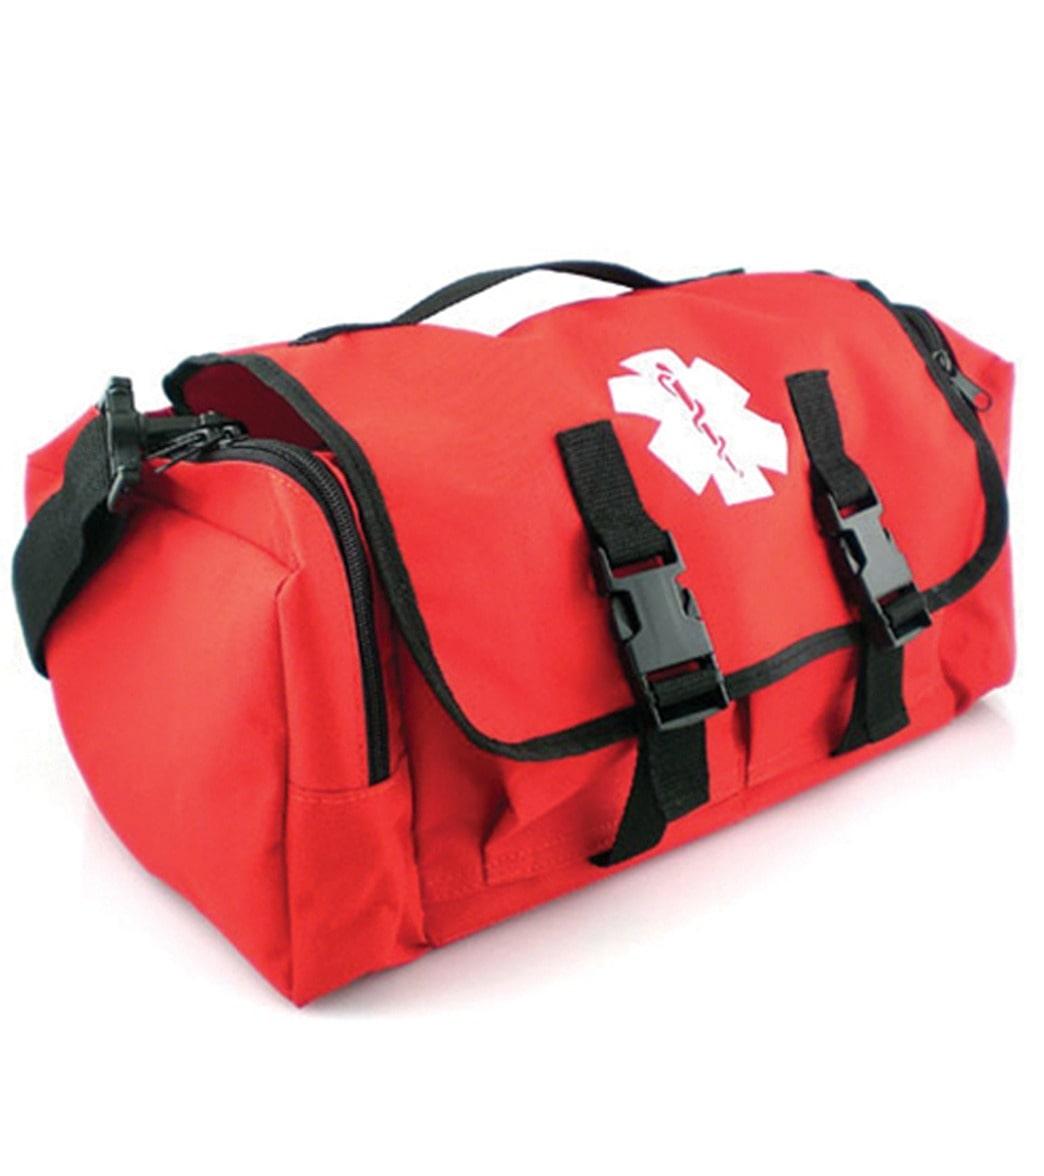 bdfcdb88e47 Line design economic lifeguard bag jpg 1044x1176 Lifeguard bags